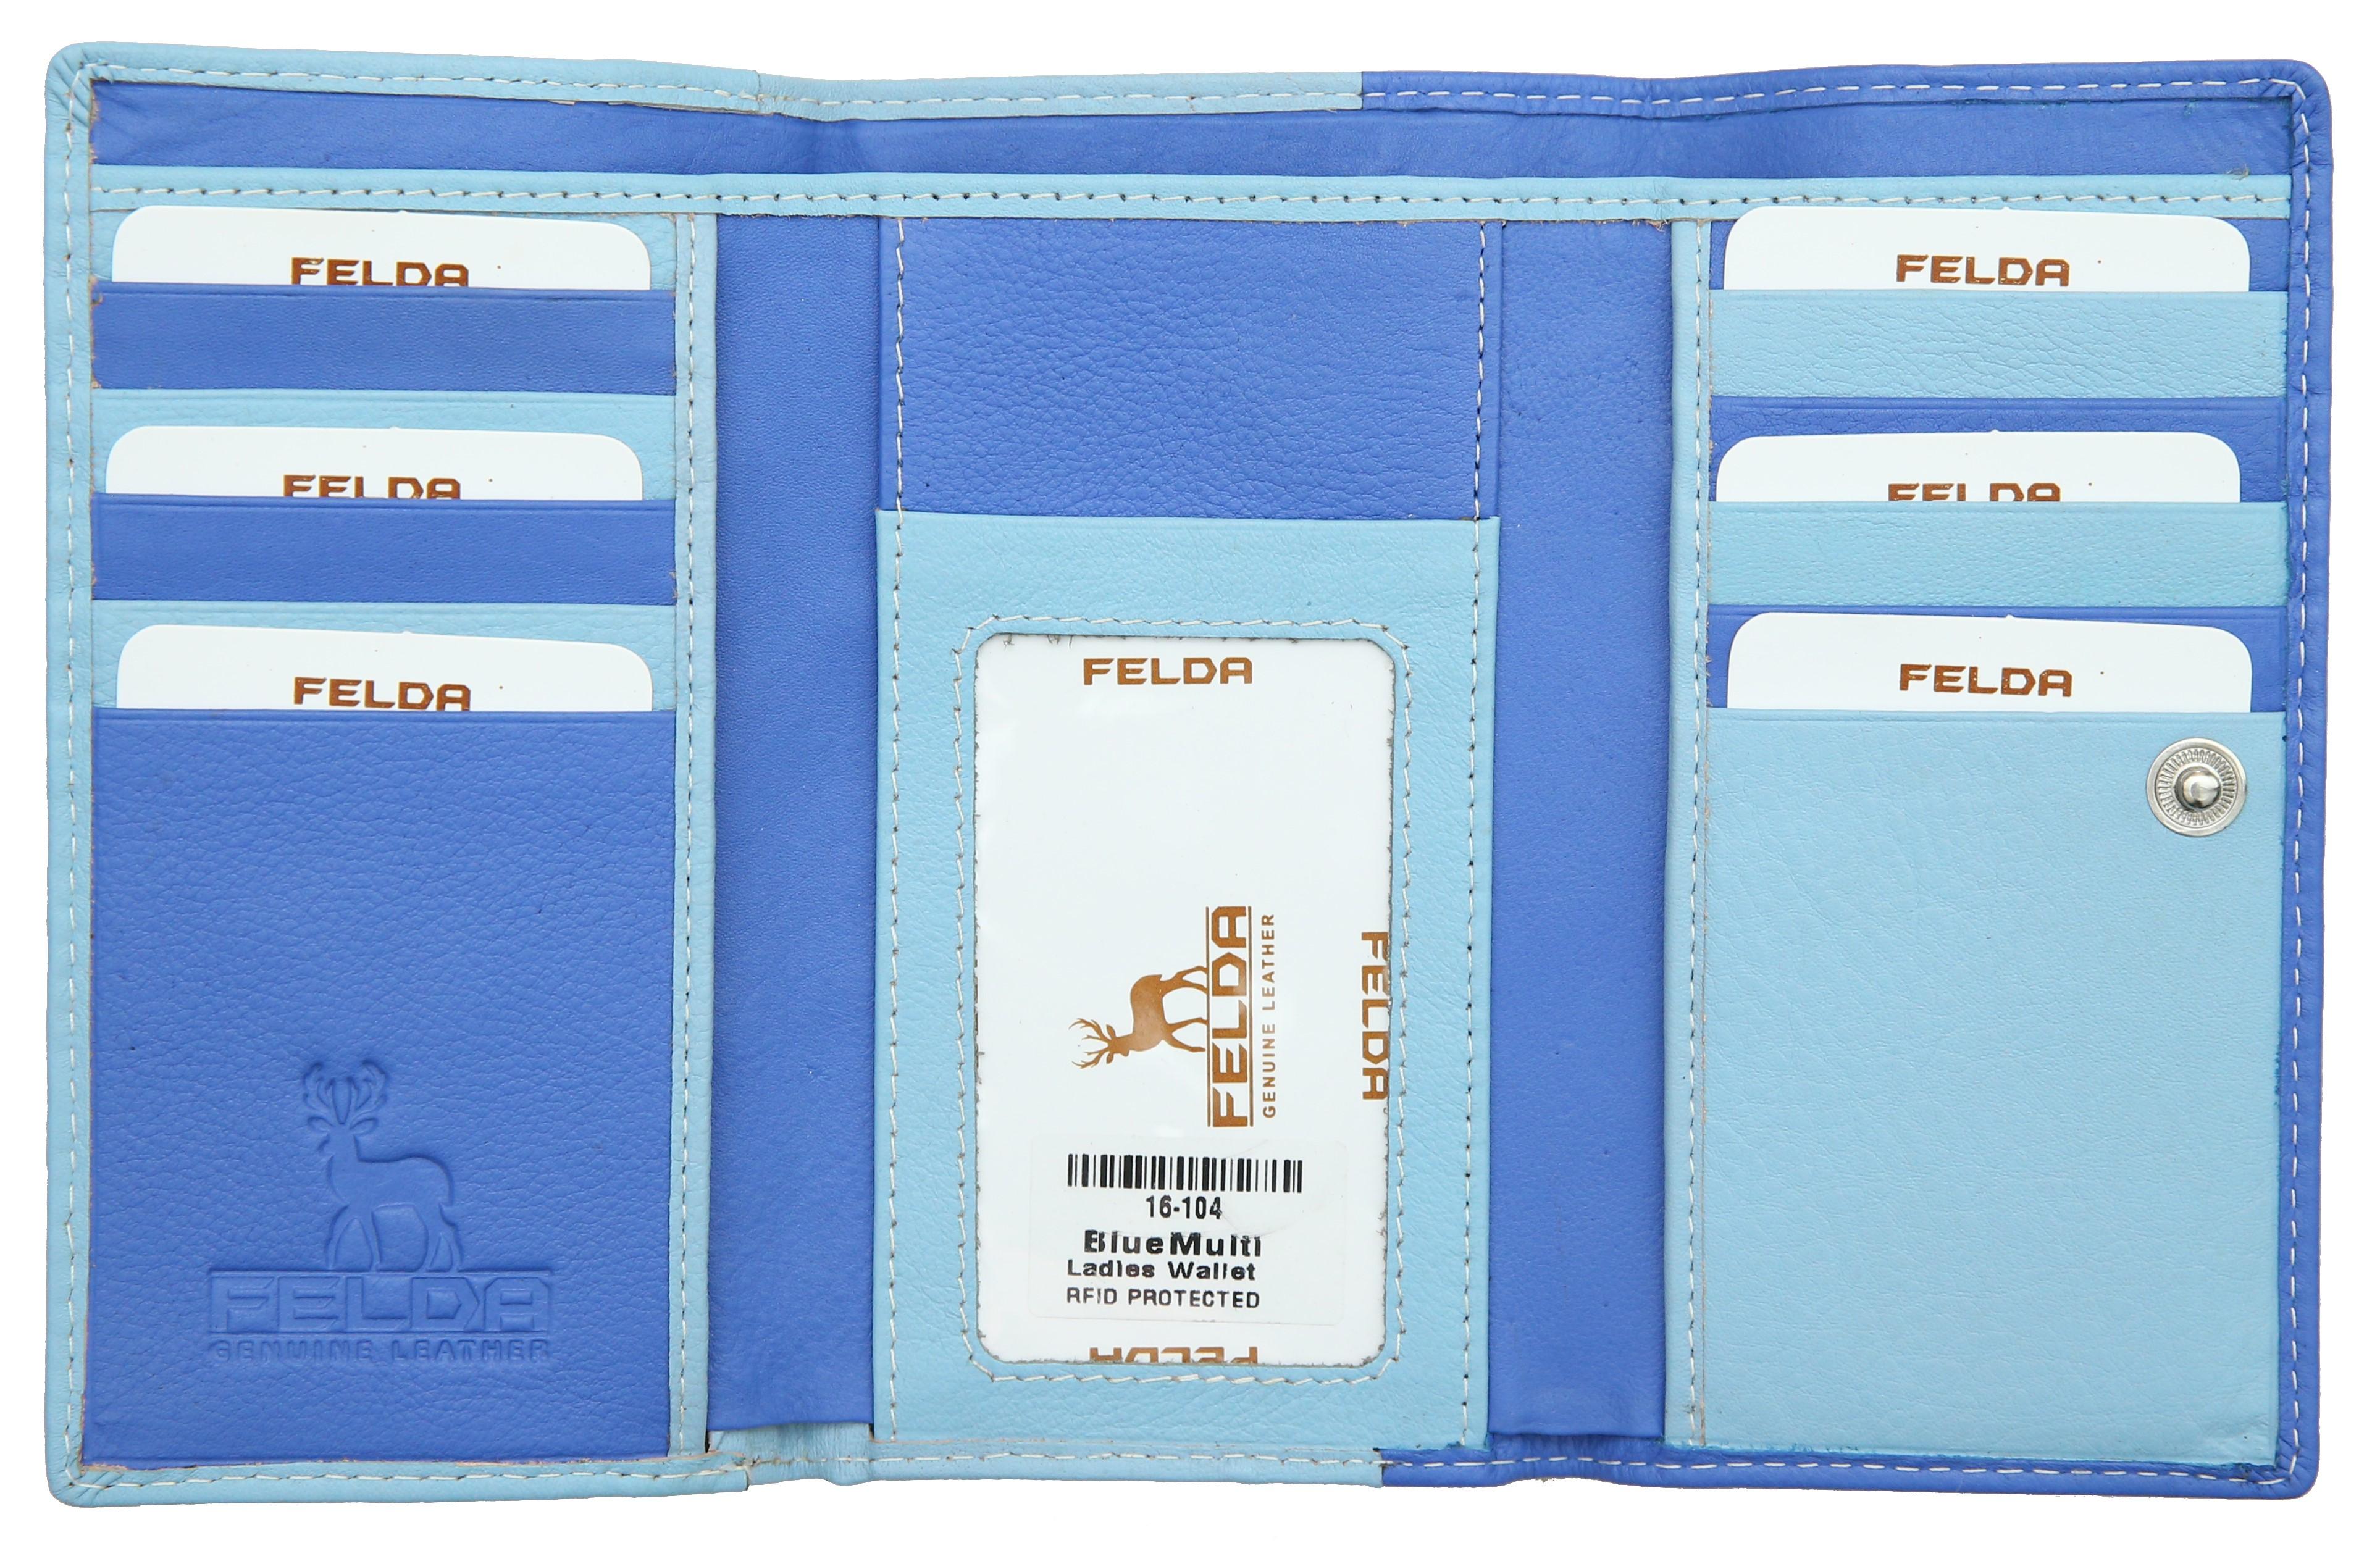 Felda-Portefeuille-pour-cartes-de-credit-cuir-souple-plusieurs-coloris miniature 14